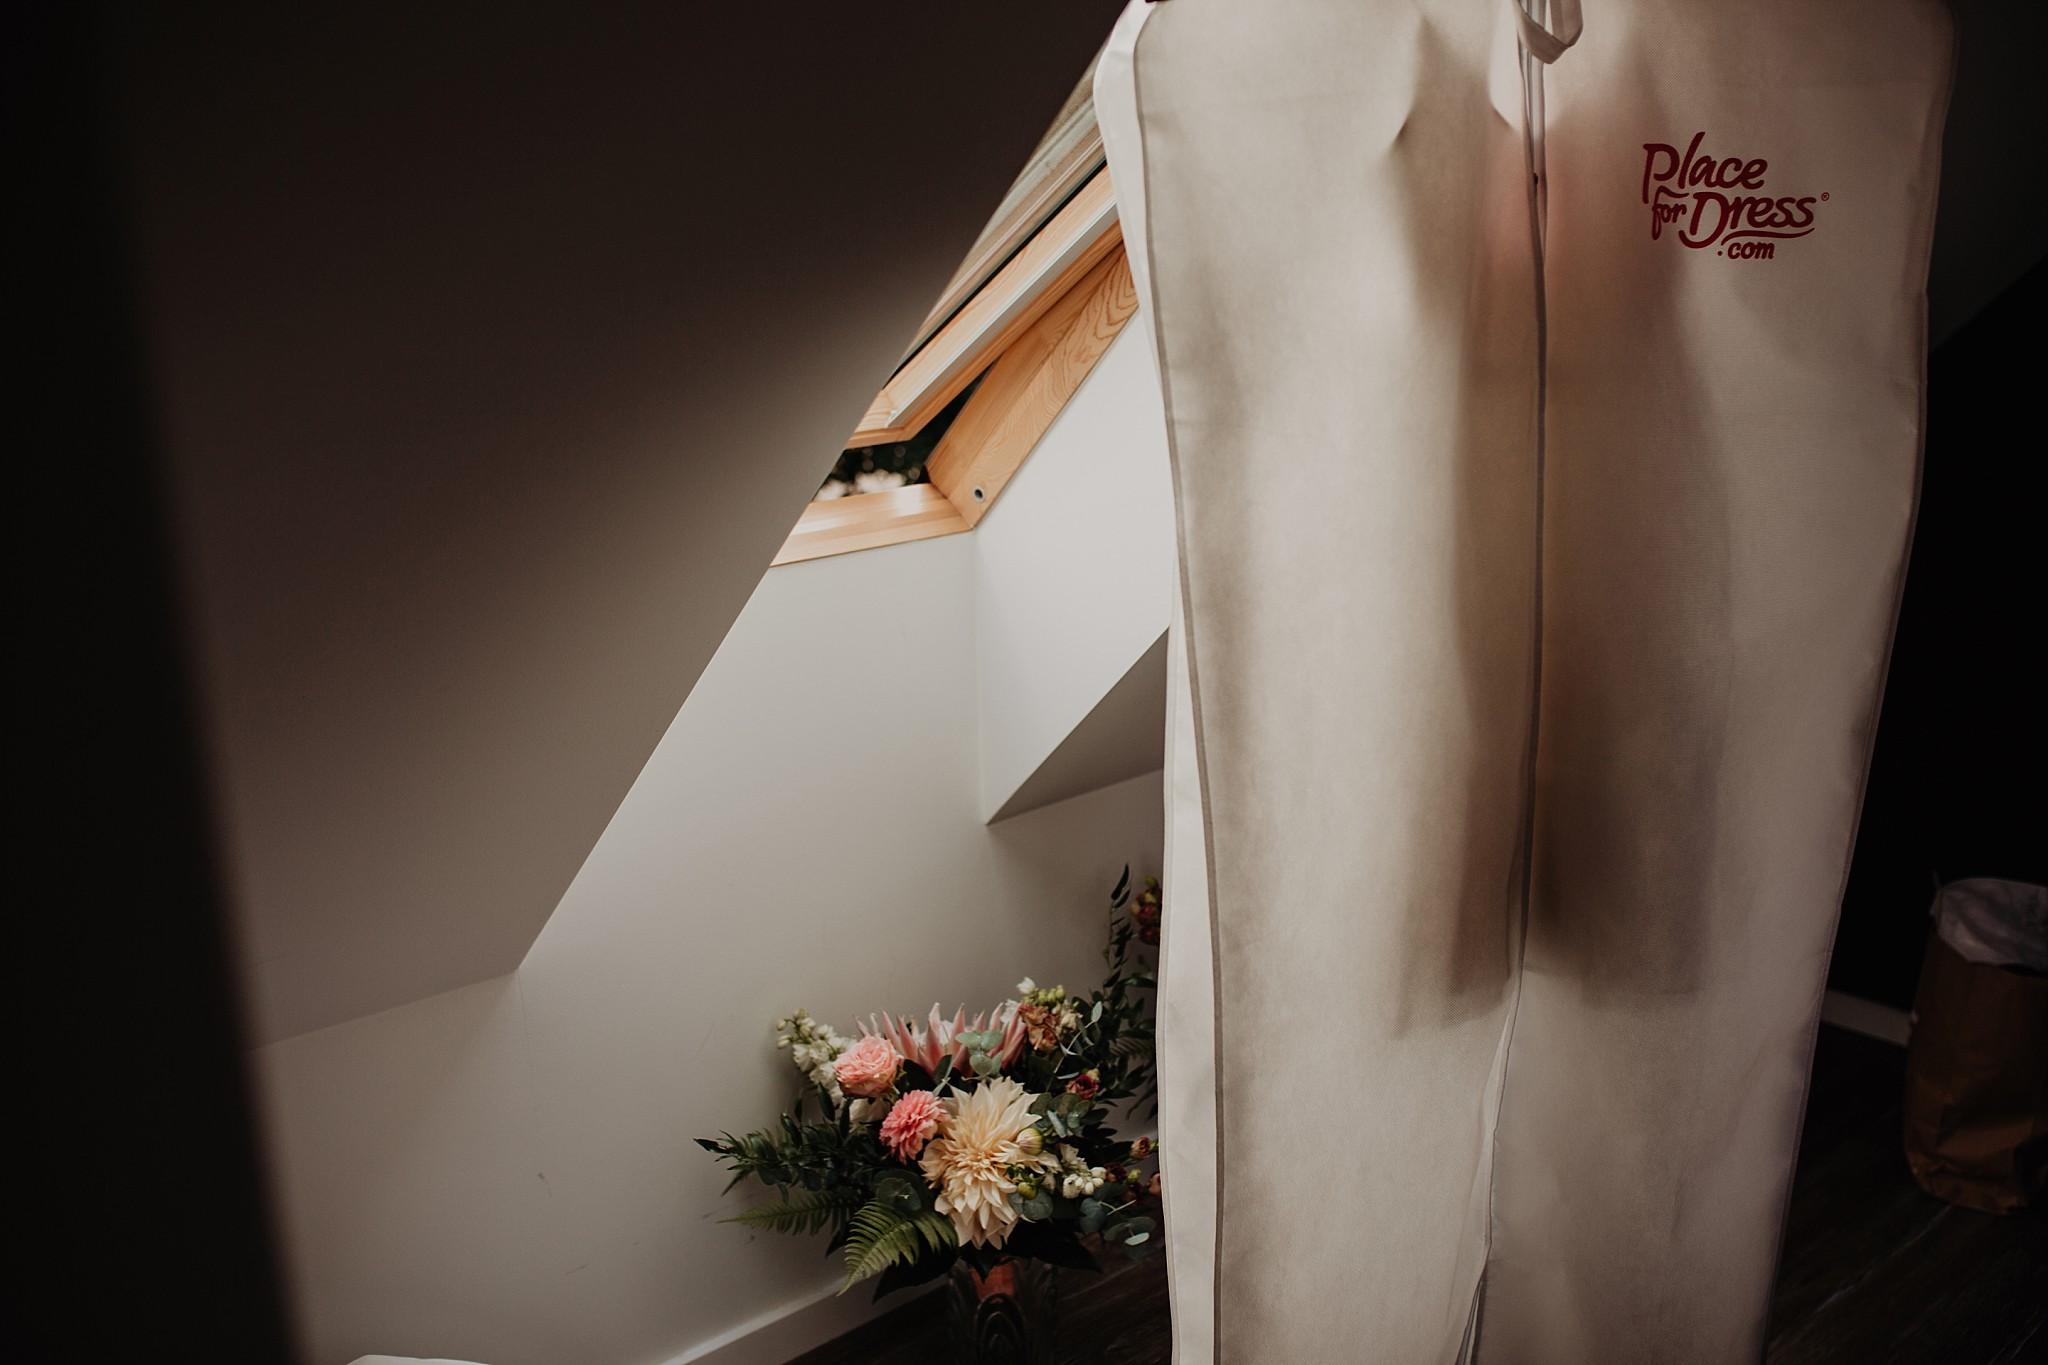 fotograf poznan wesele dobra truskawka piekne wesele pod poznaniem wesele w dobrej truskawce piekna para mloda slub marzen slub koronawirus slub listopad wesele koronawirus 077